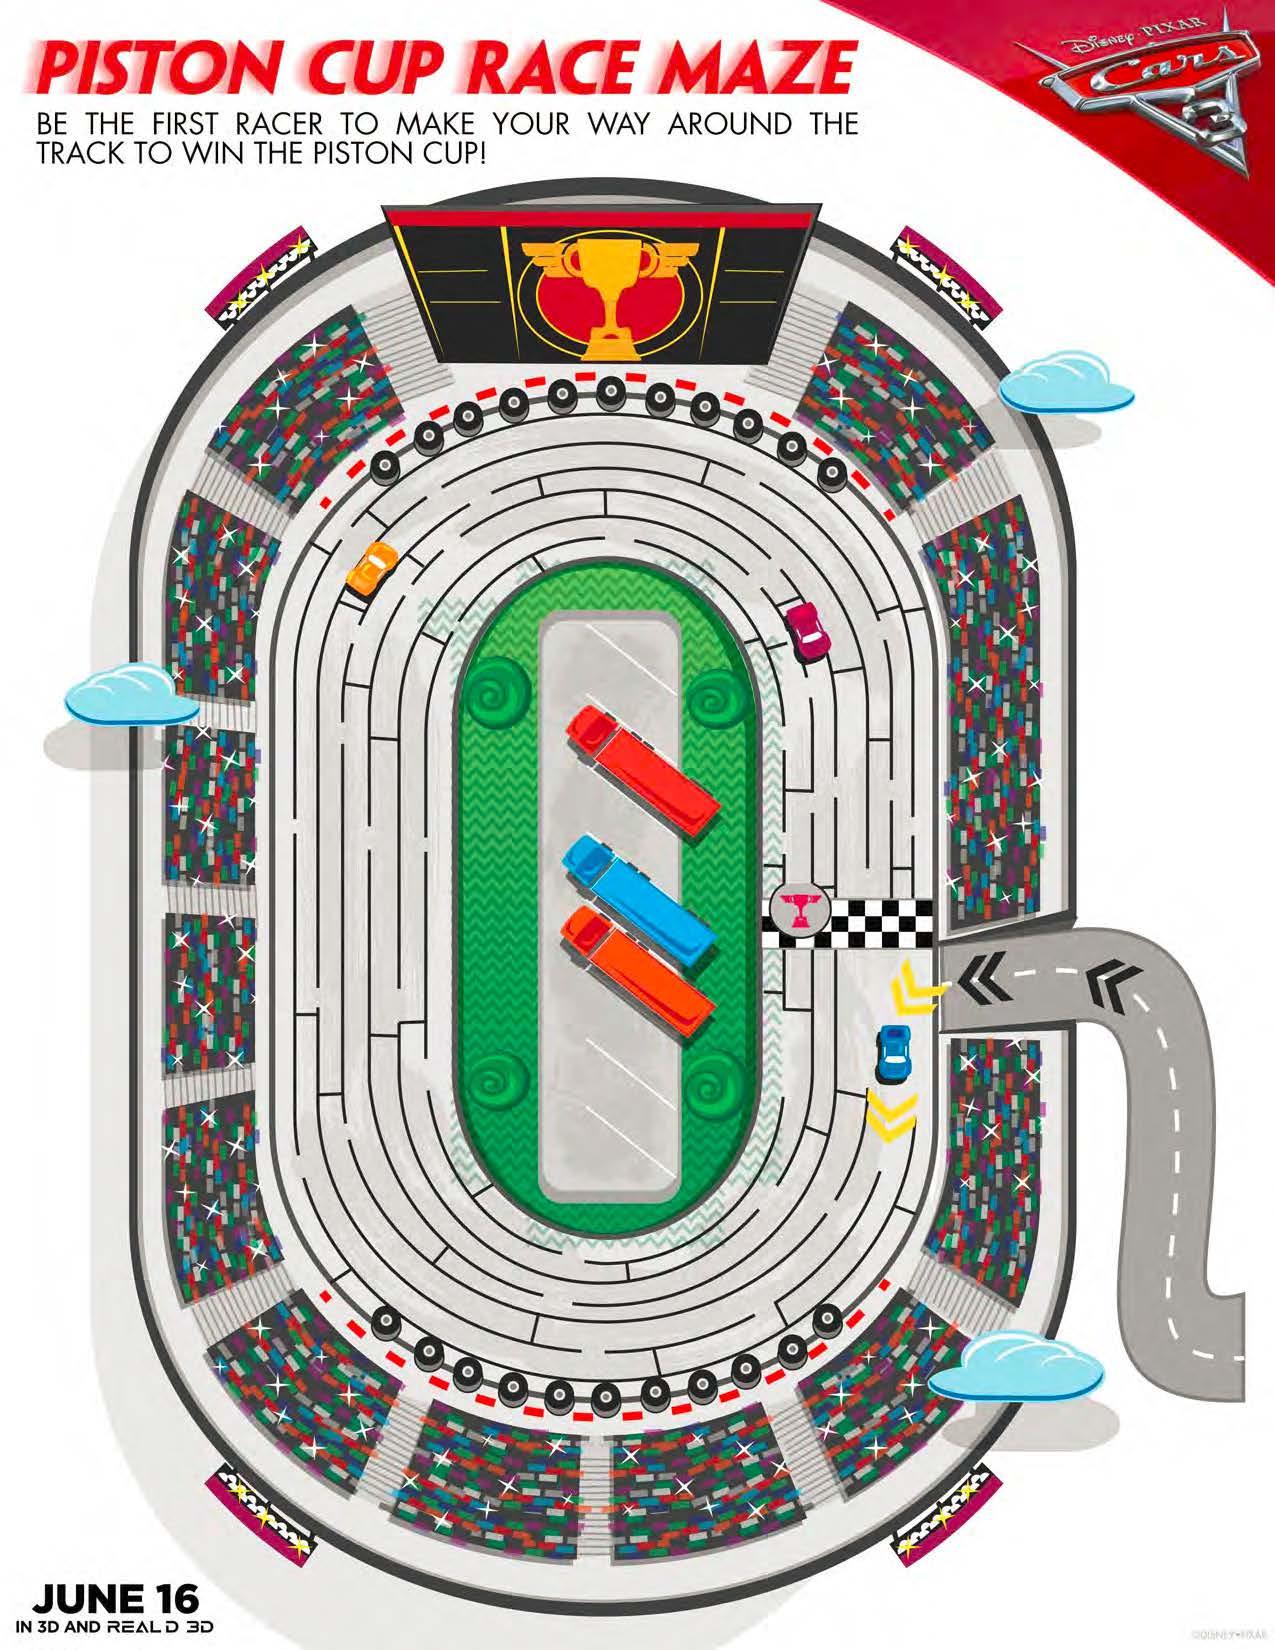 Cars 3 Activity Sheet - Piston Cup Race Maze